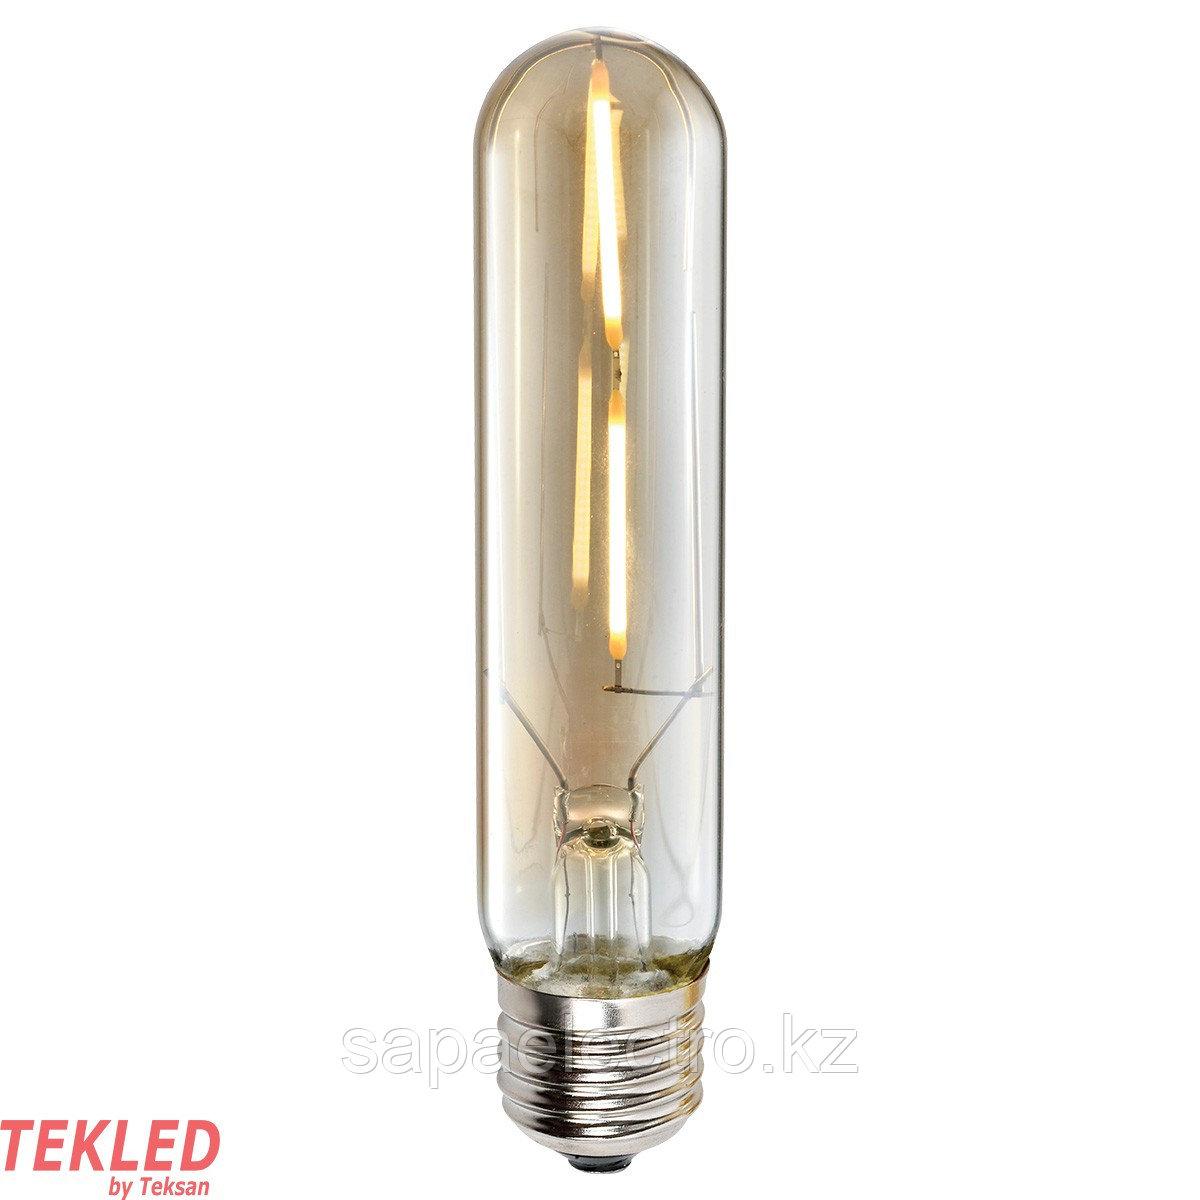 Лампа LED T125 4W AMBER E27 2700K 220V (TL)100шт